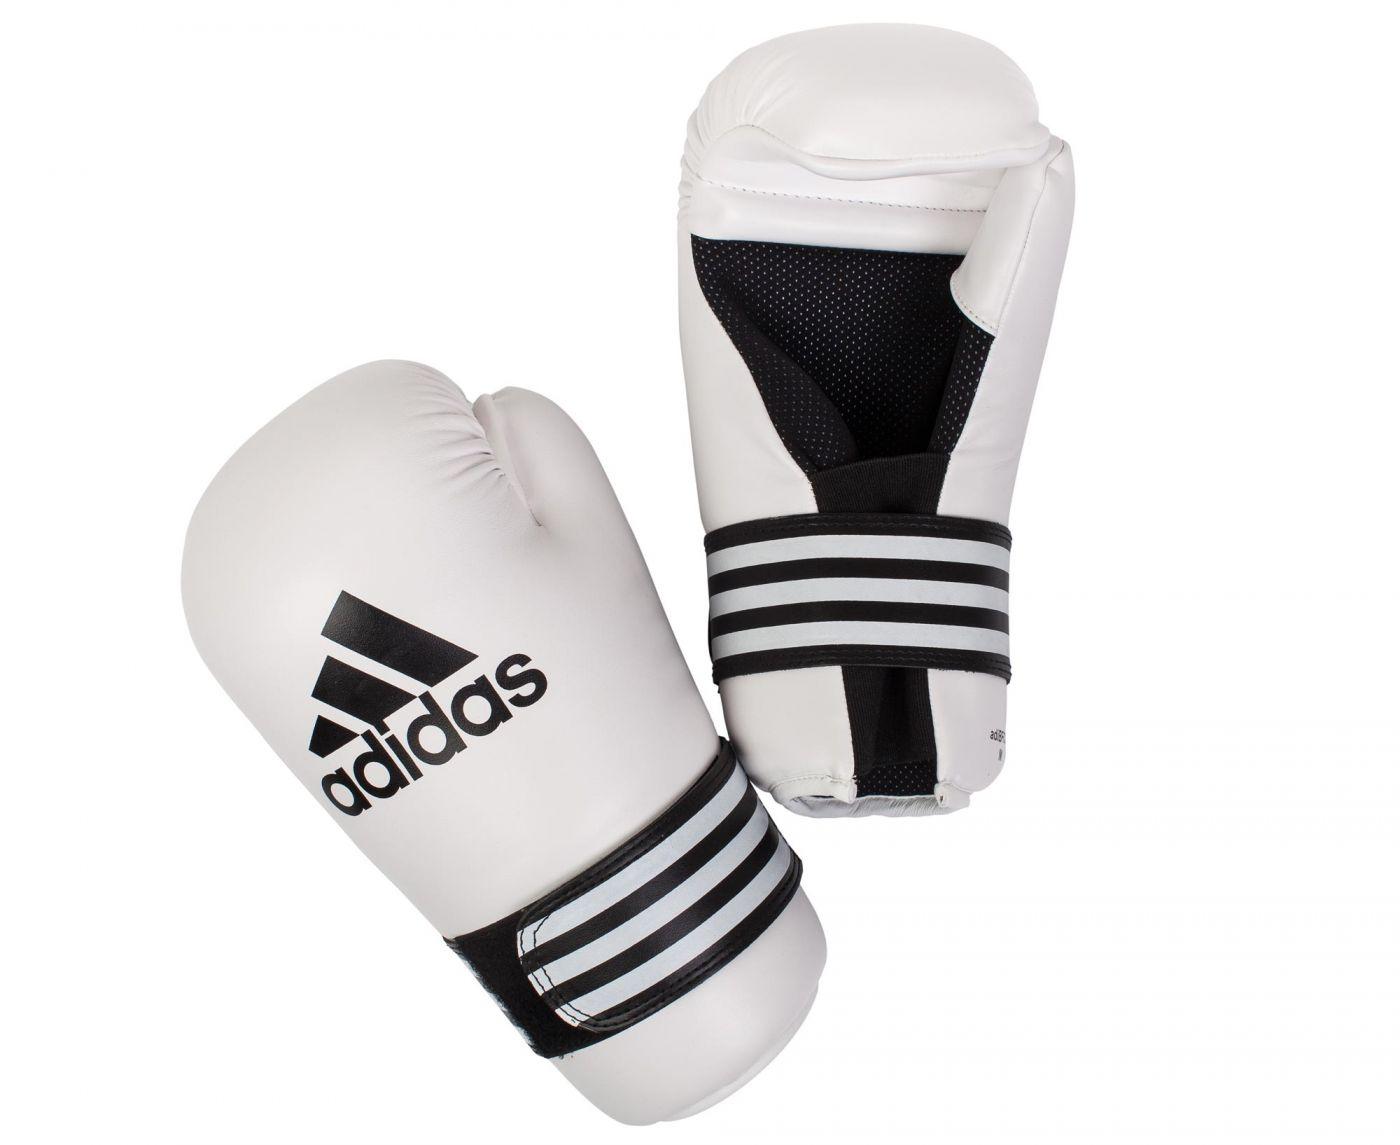 Перчатки для полуконтакт Adidas Semi Contact Gloves белые , размер L, артикул adiBFC01